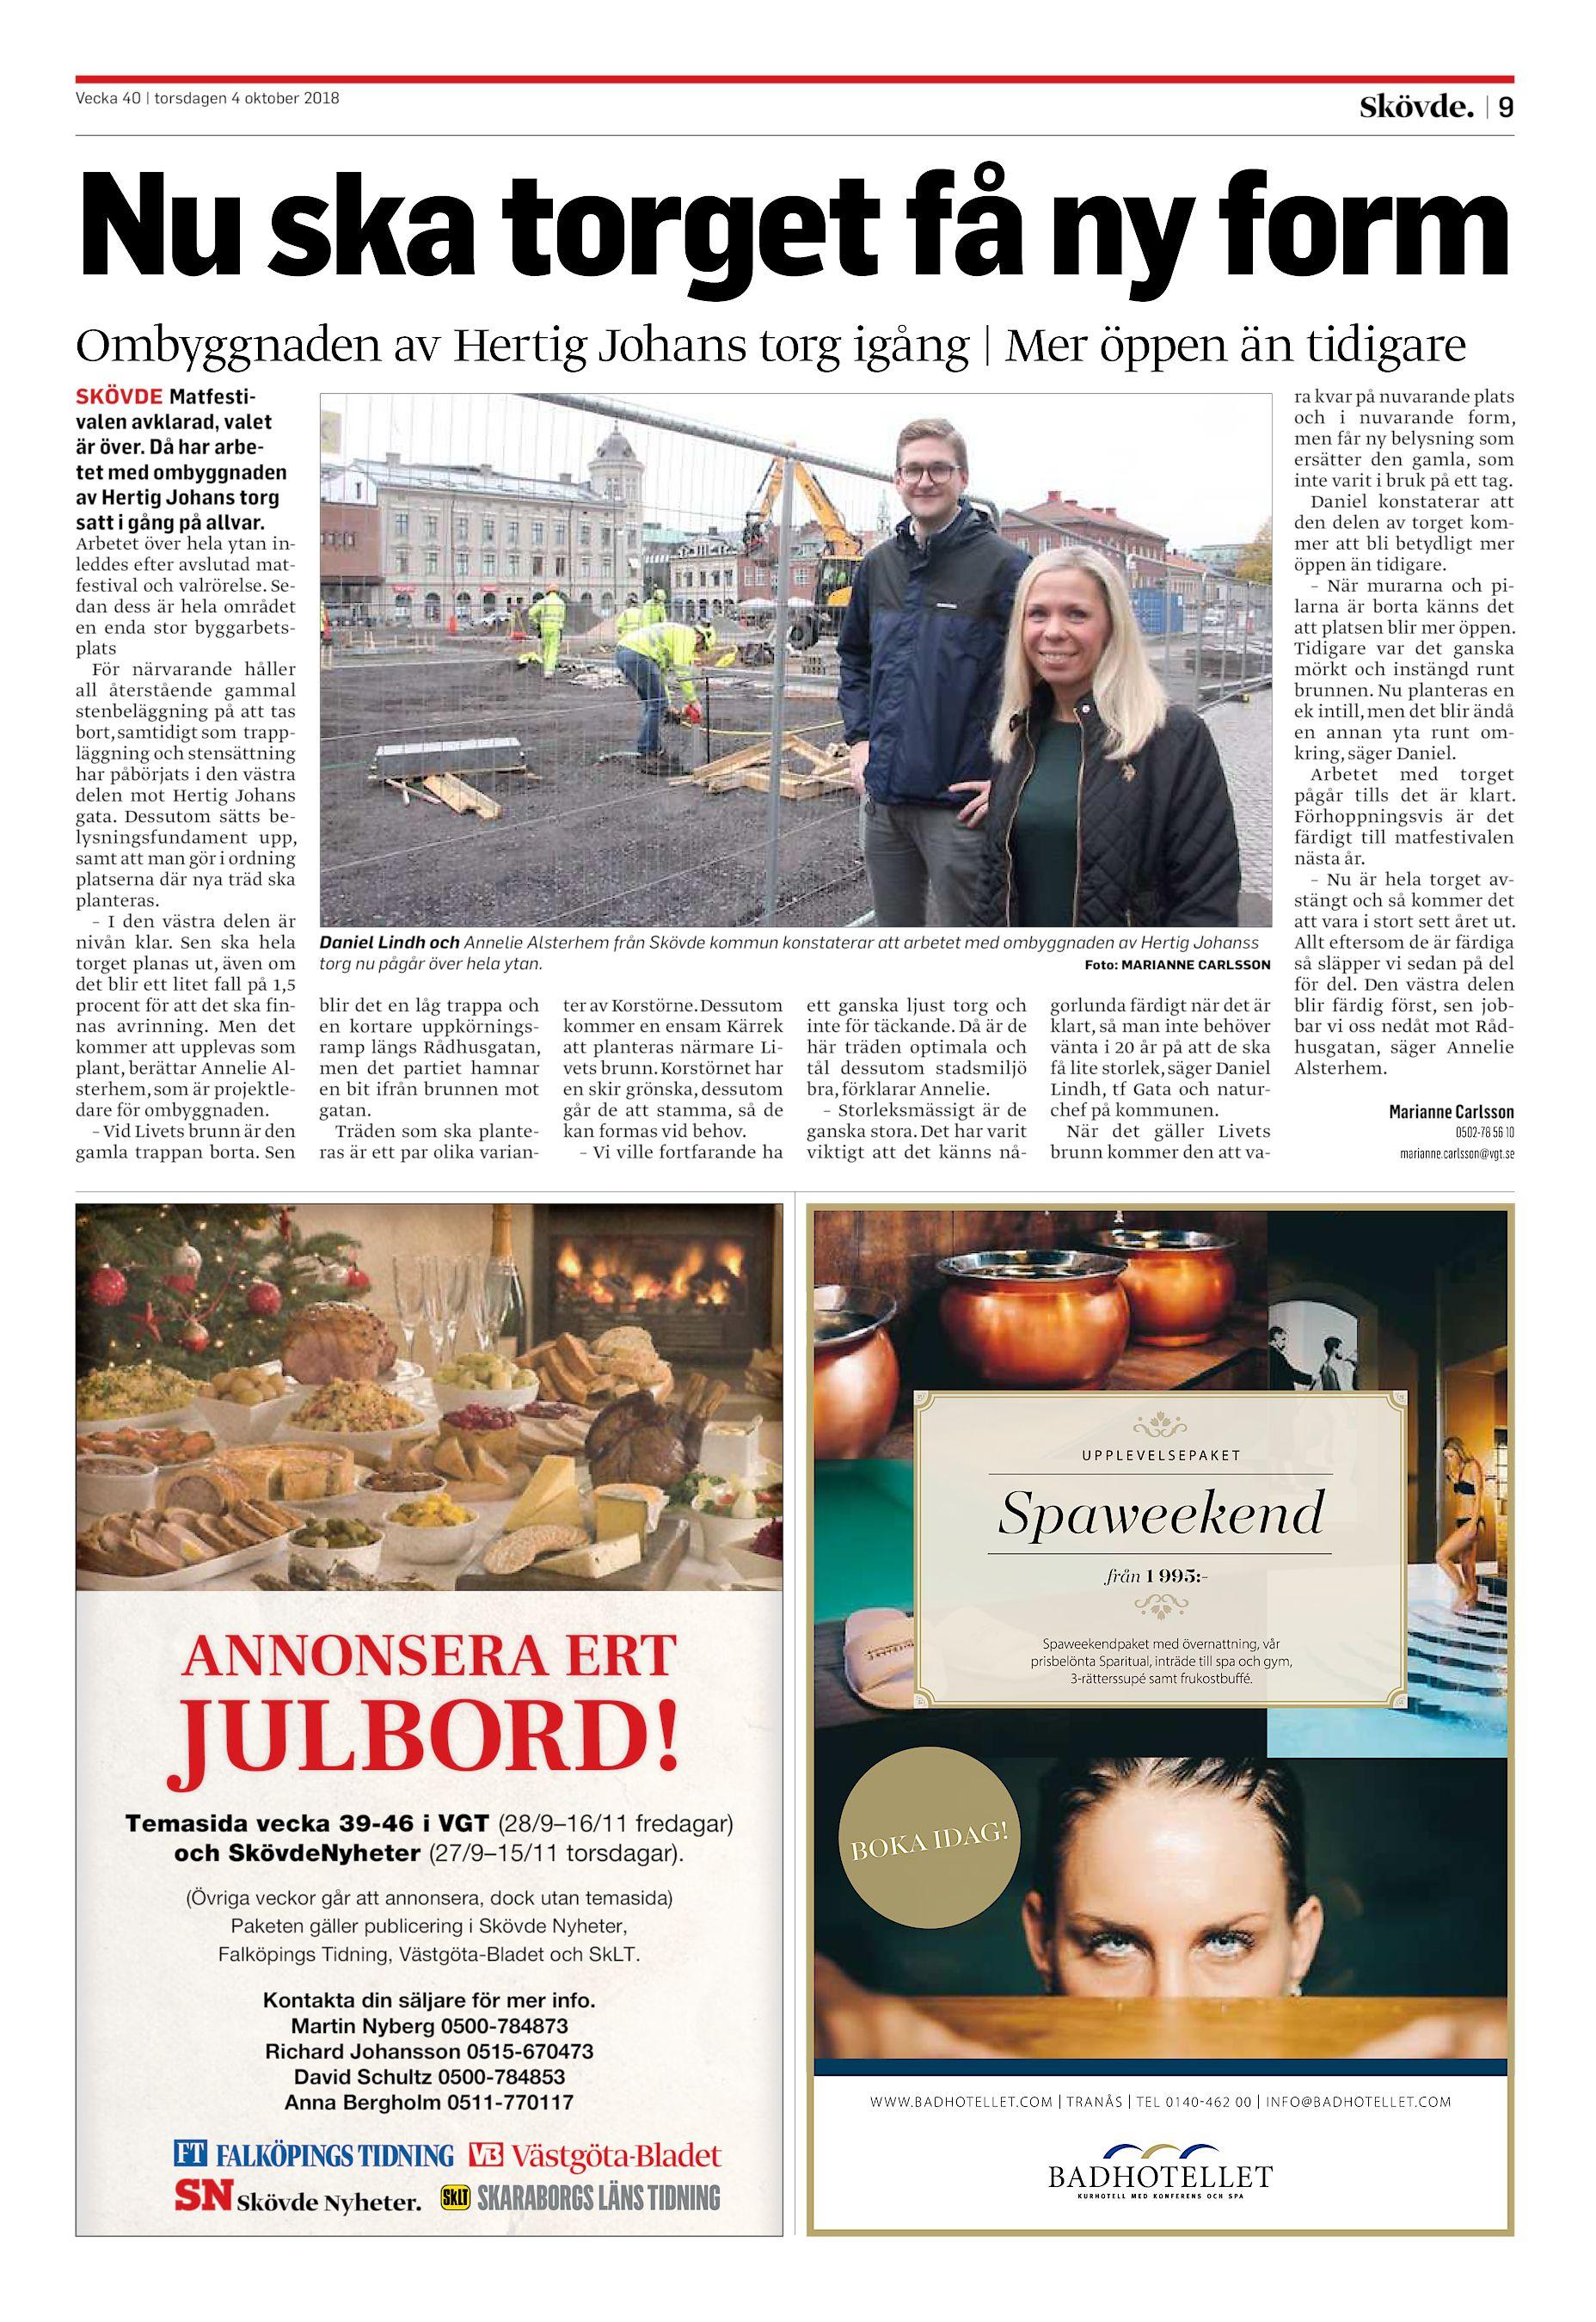 Skövde Nyheter SN-20181004 (endast text) 370be53592614